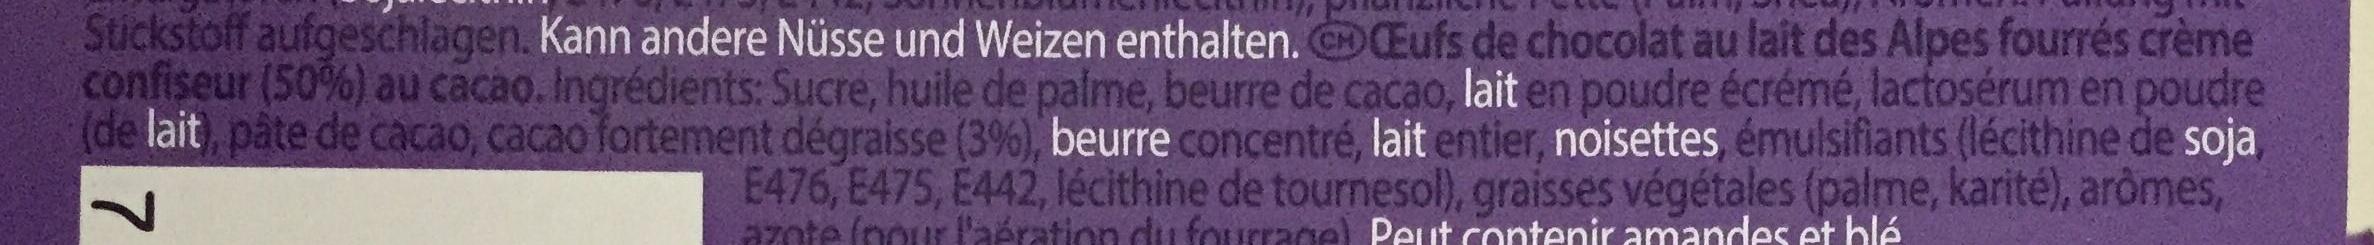 Löffel-Ei Kakaocrème - Ingrédients - fr